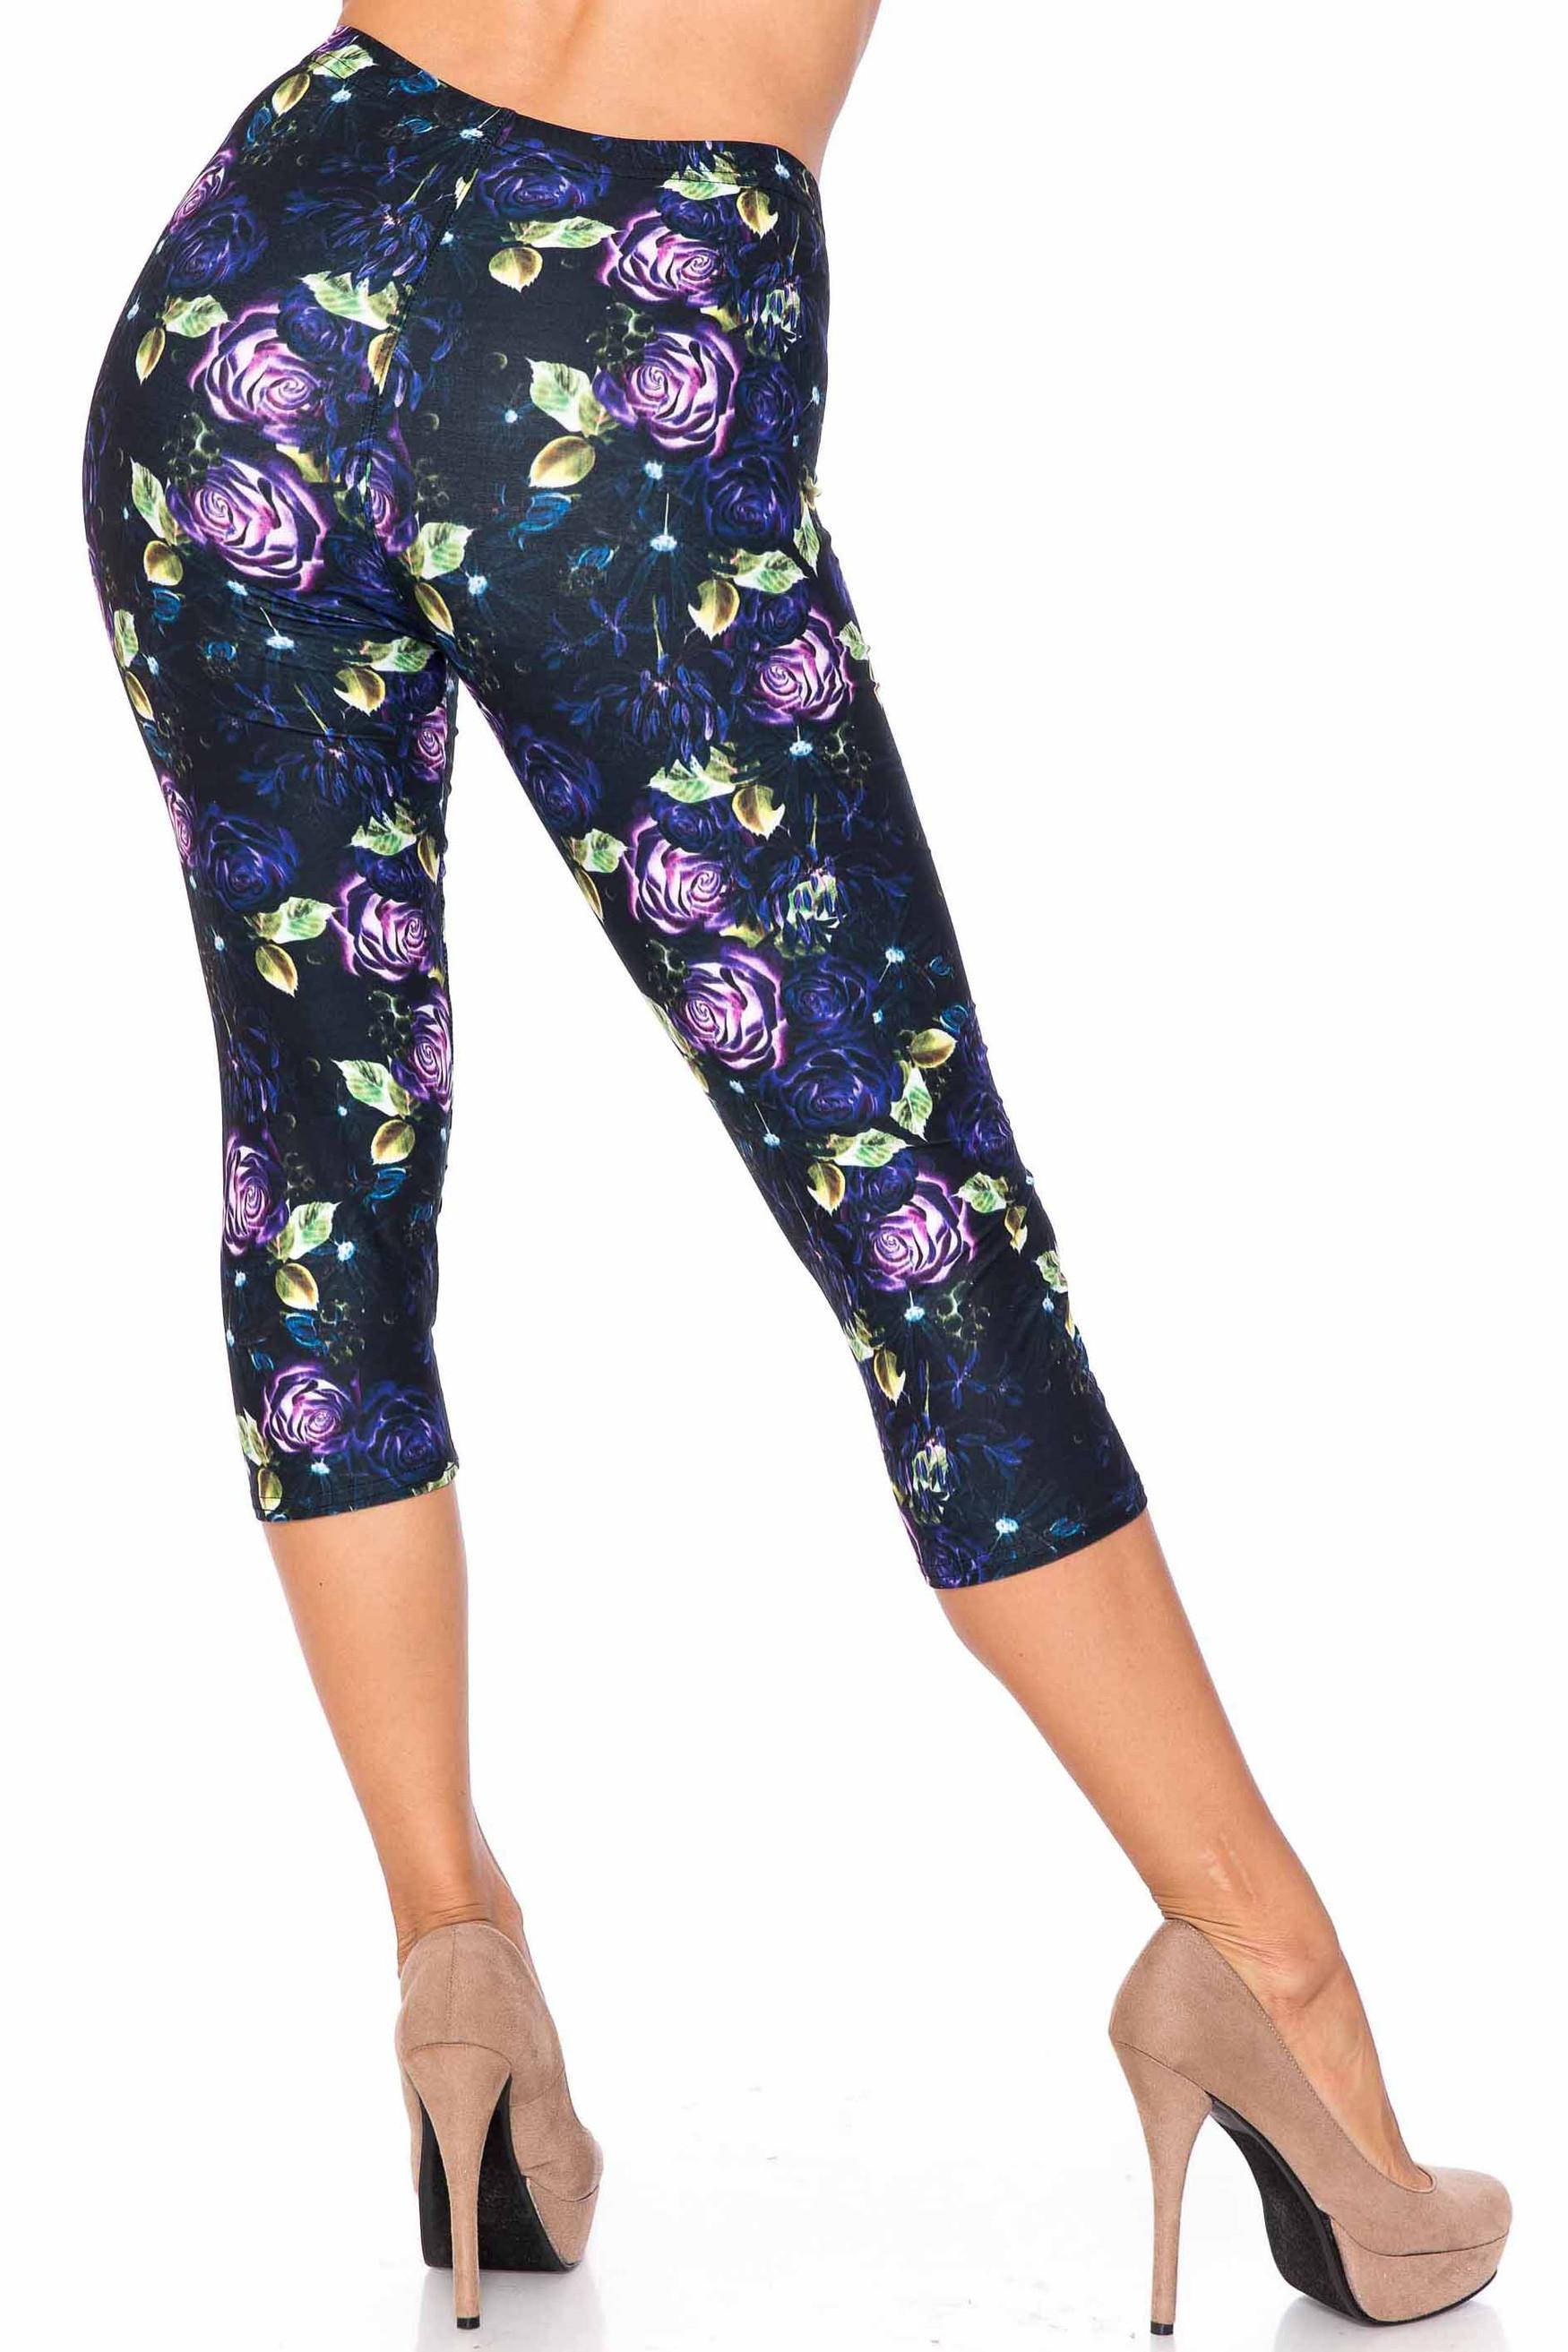 Creamy Soft Purple and Violet Rose Plus Size Capris - USA Fashion™